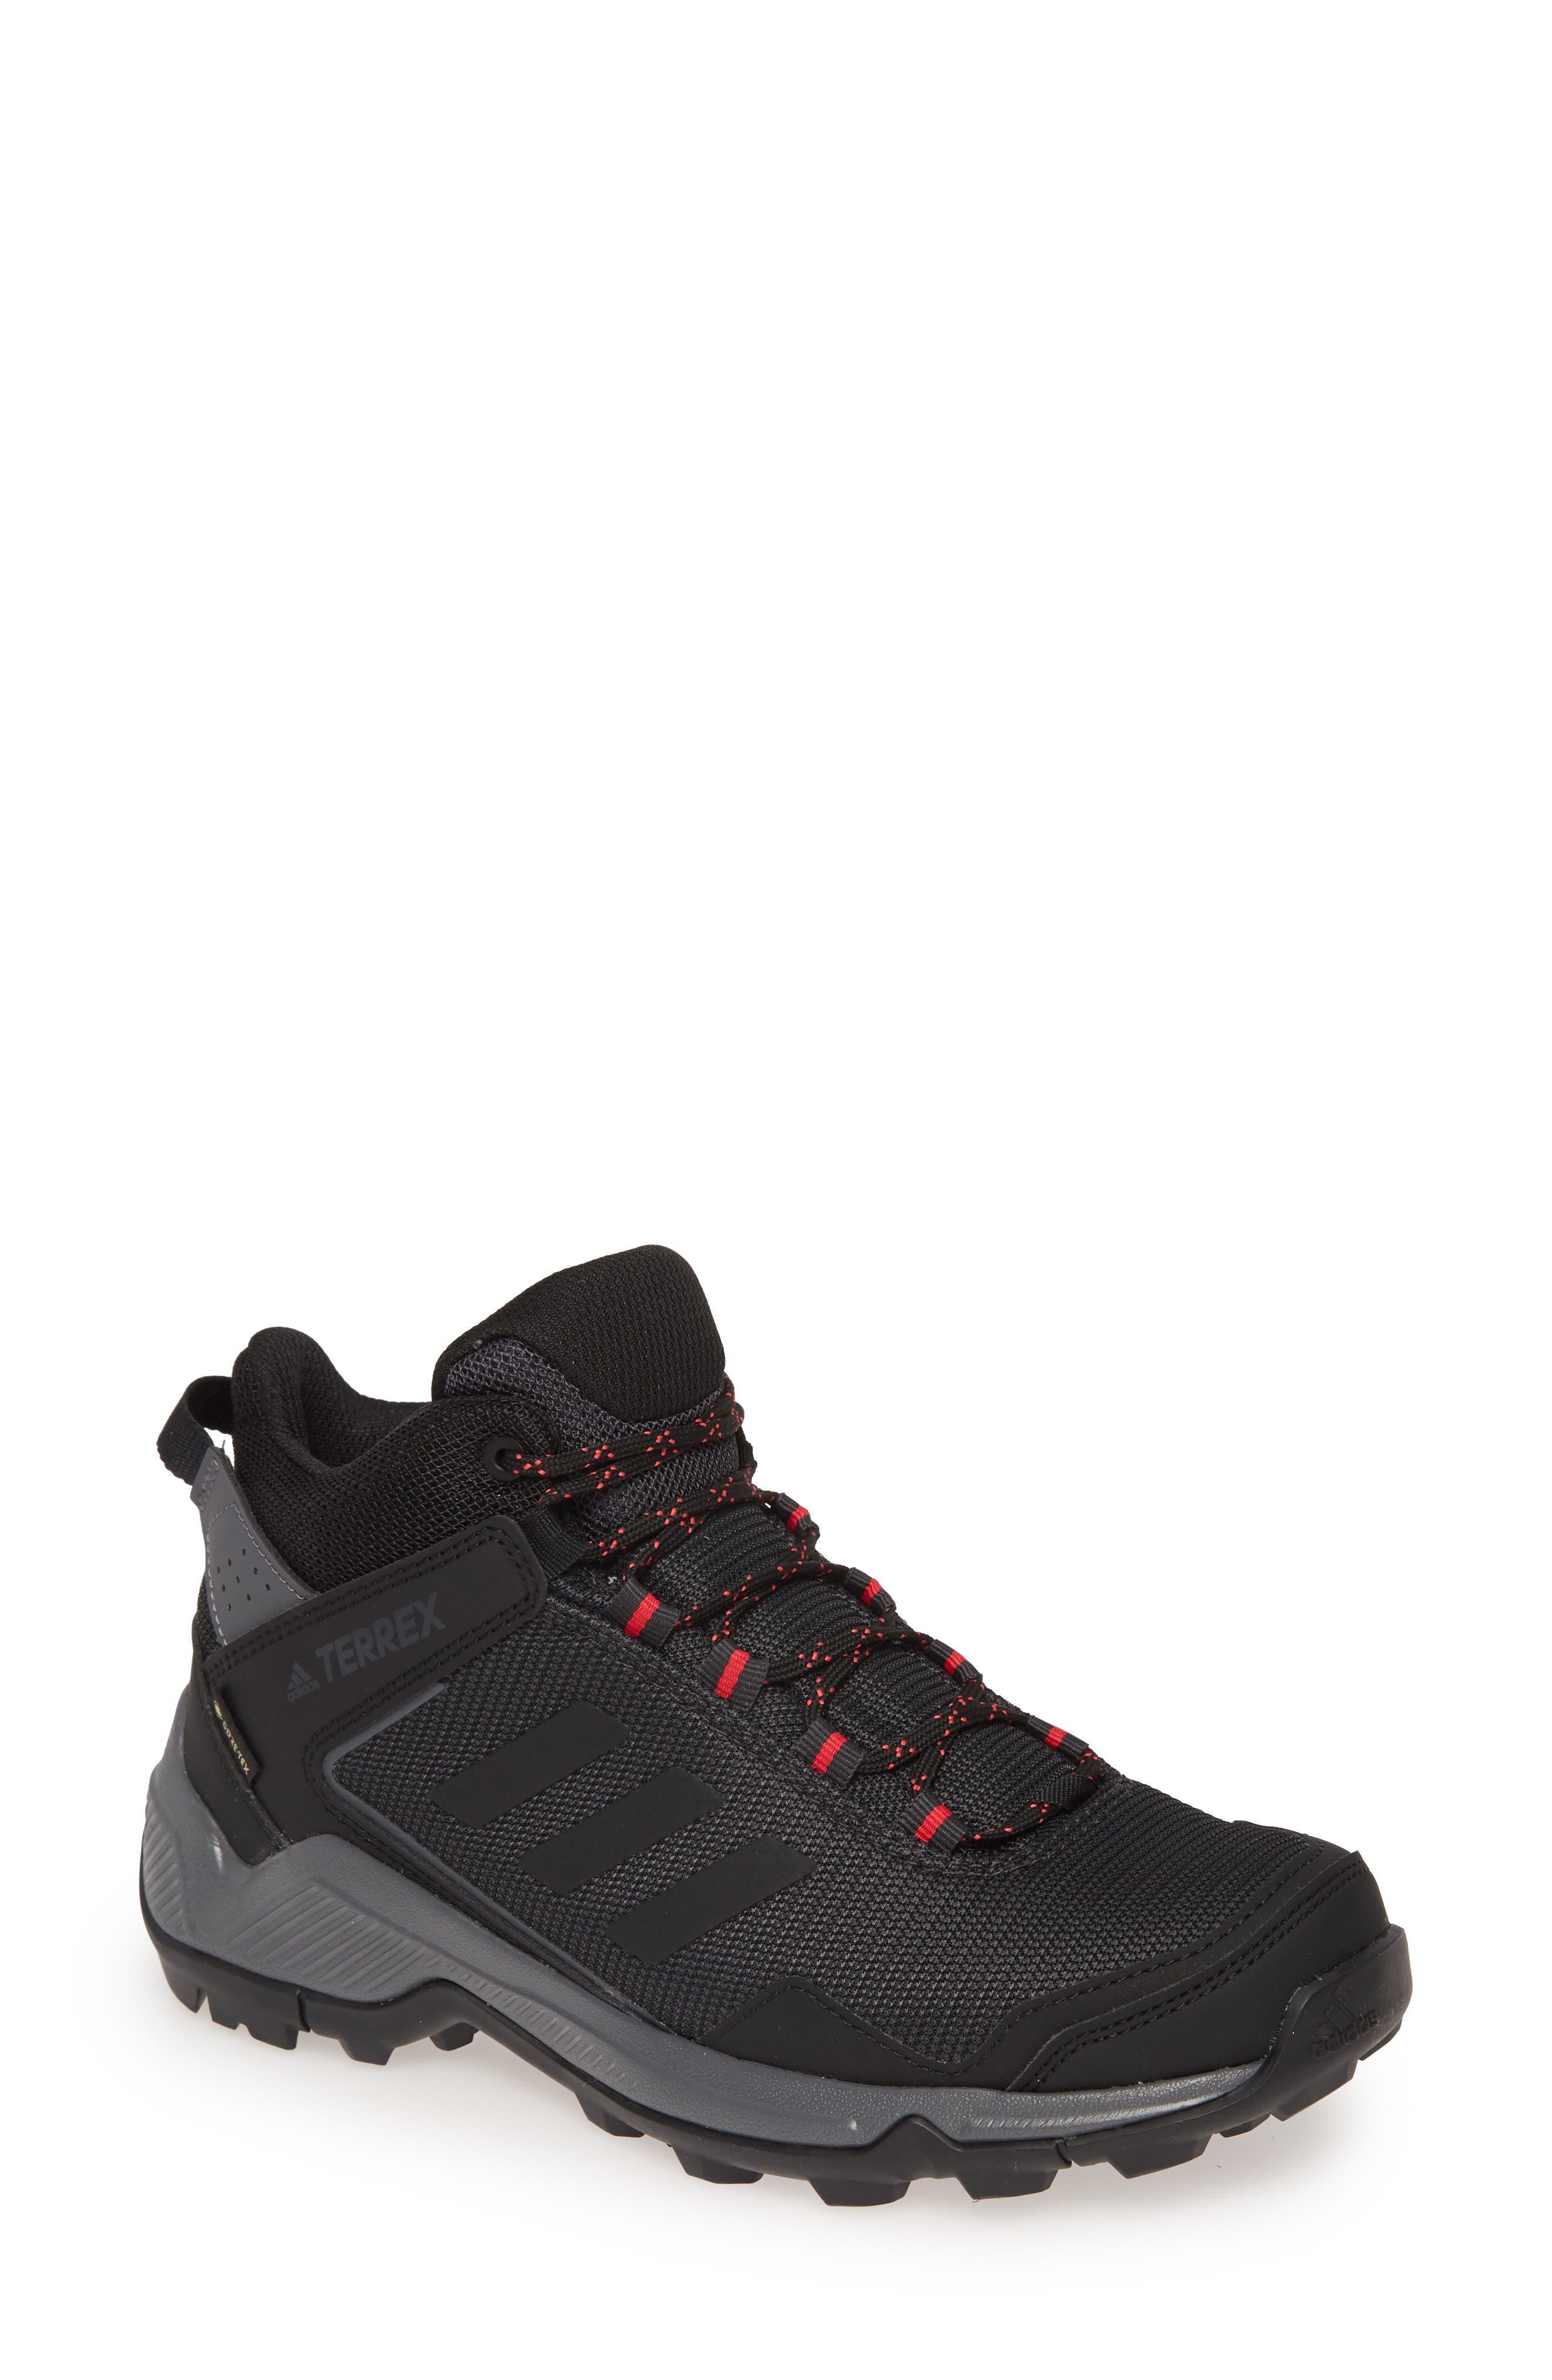 adidas Women's Vibe Energy Boost Shoes Black | adidas Canada